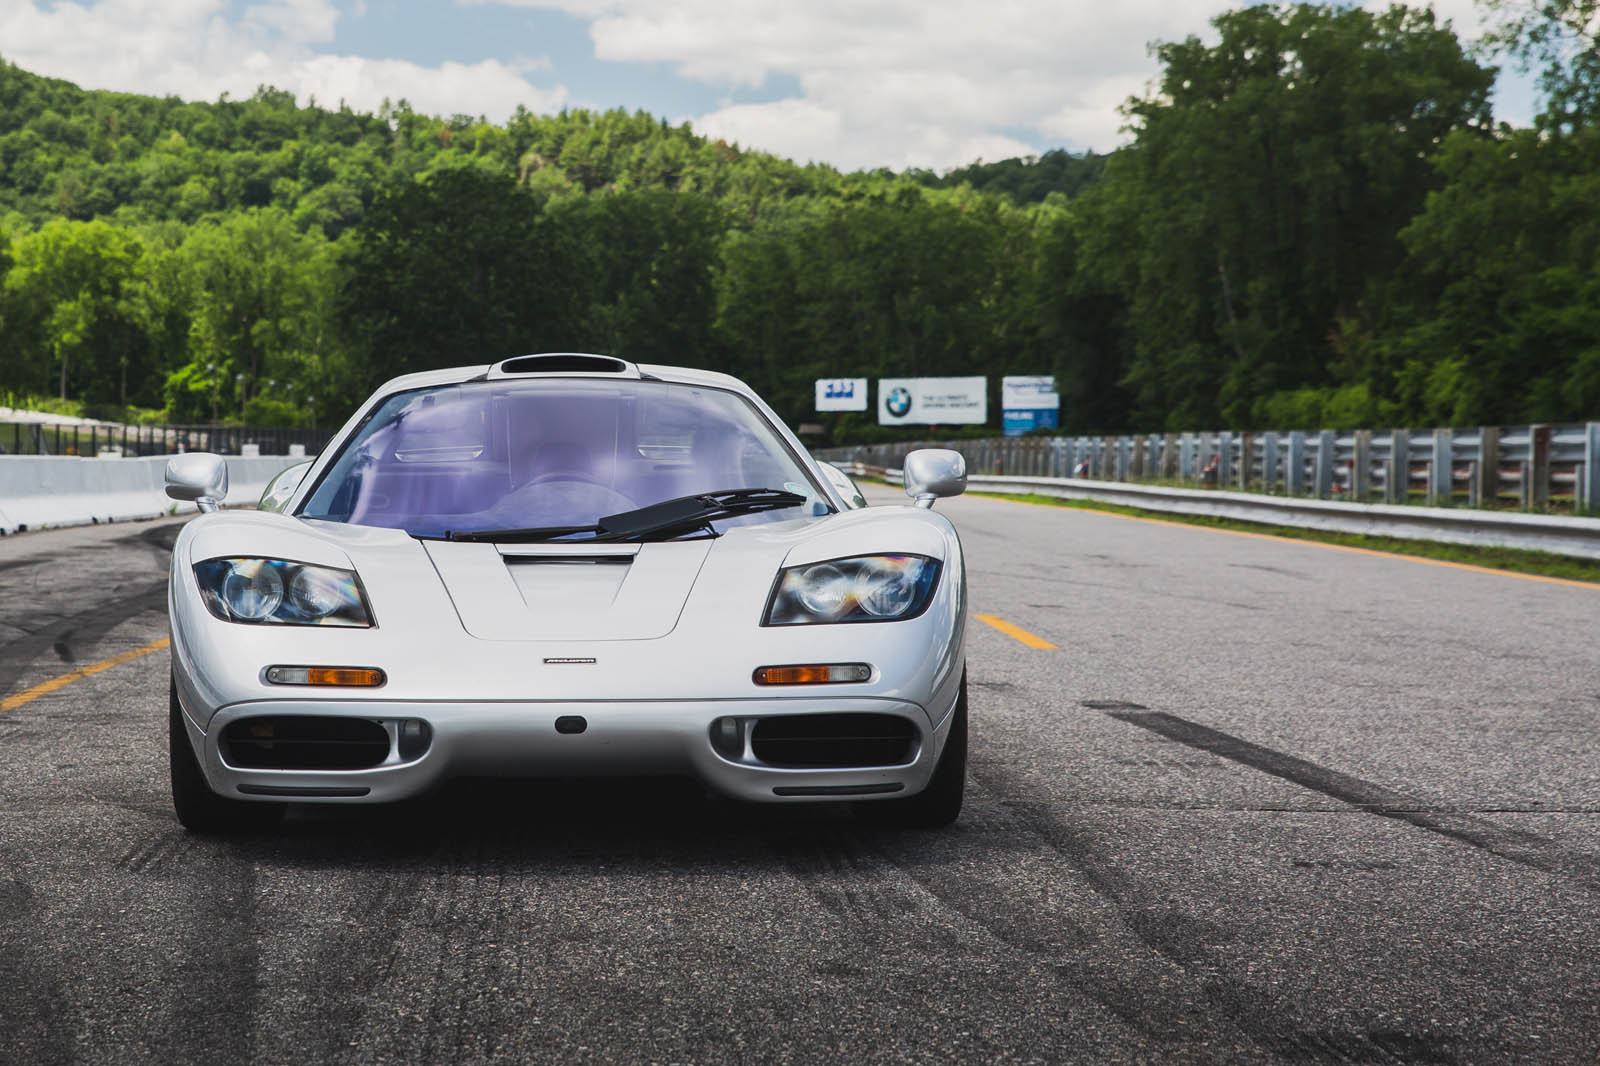 McLaren_F1-13 copy